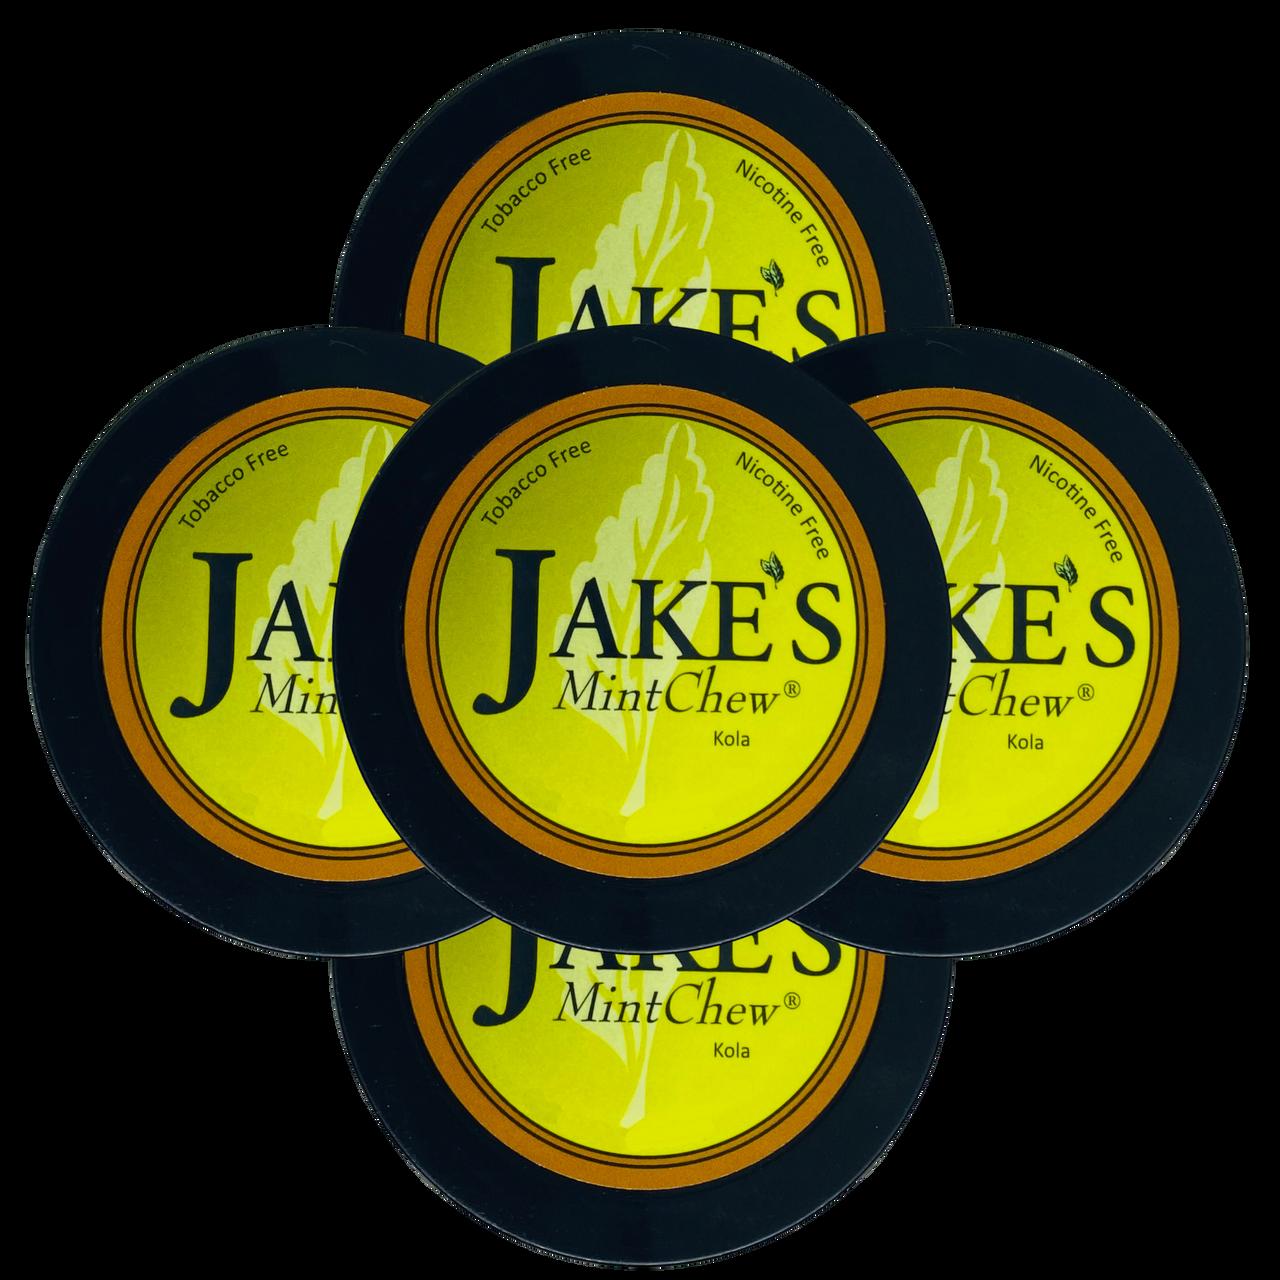 Jake's Mint Herbal Chew Kola 5 Cans